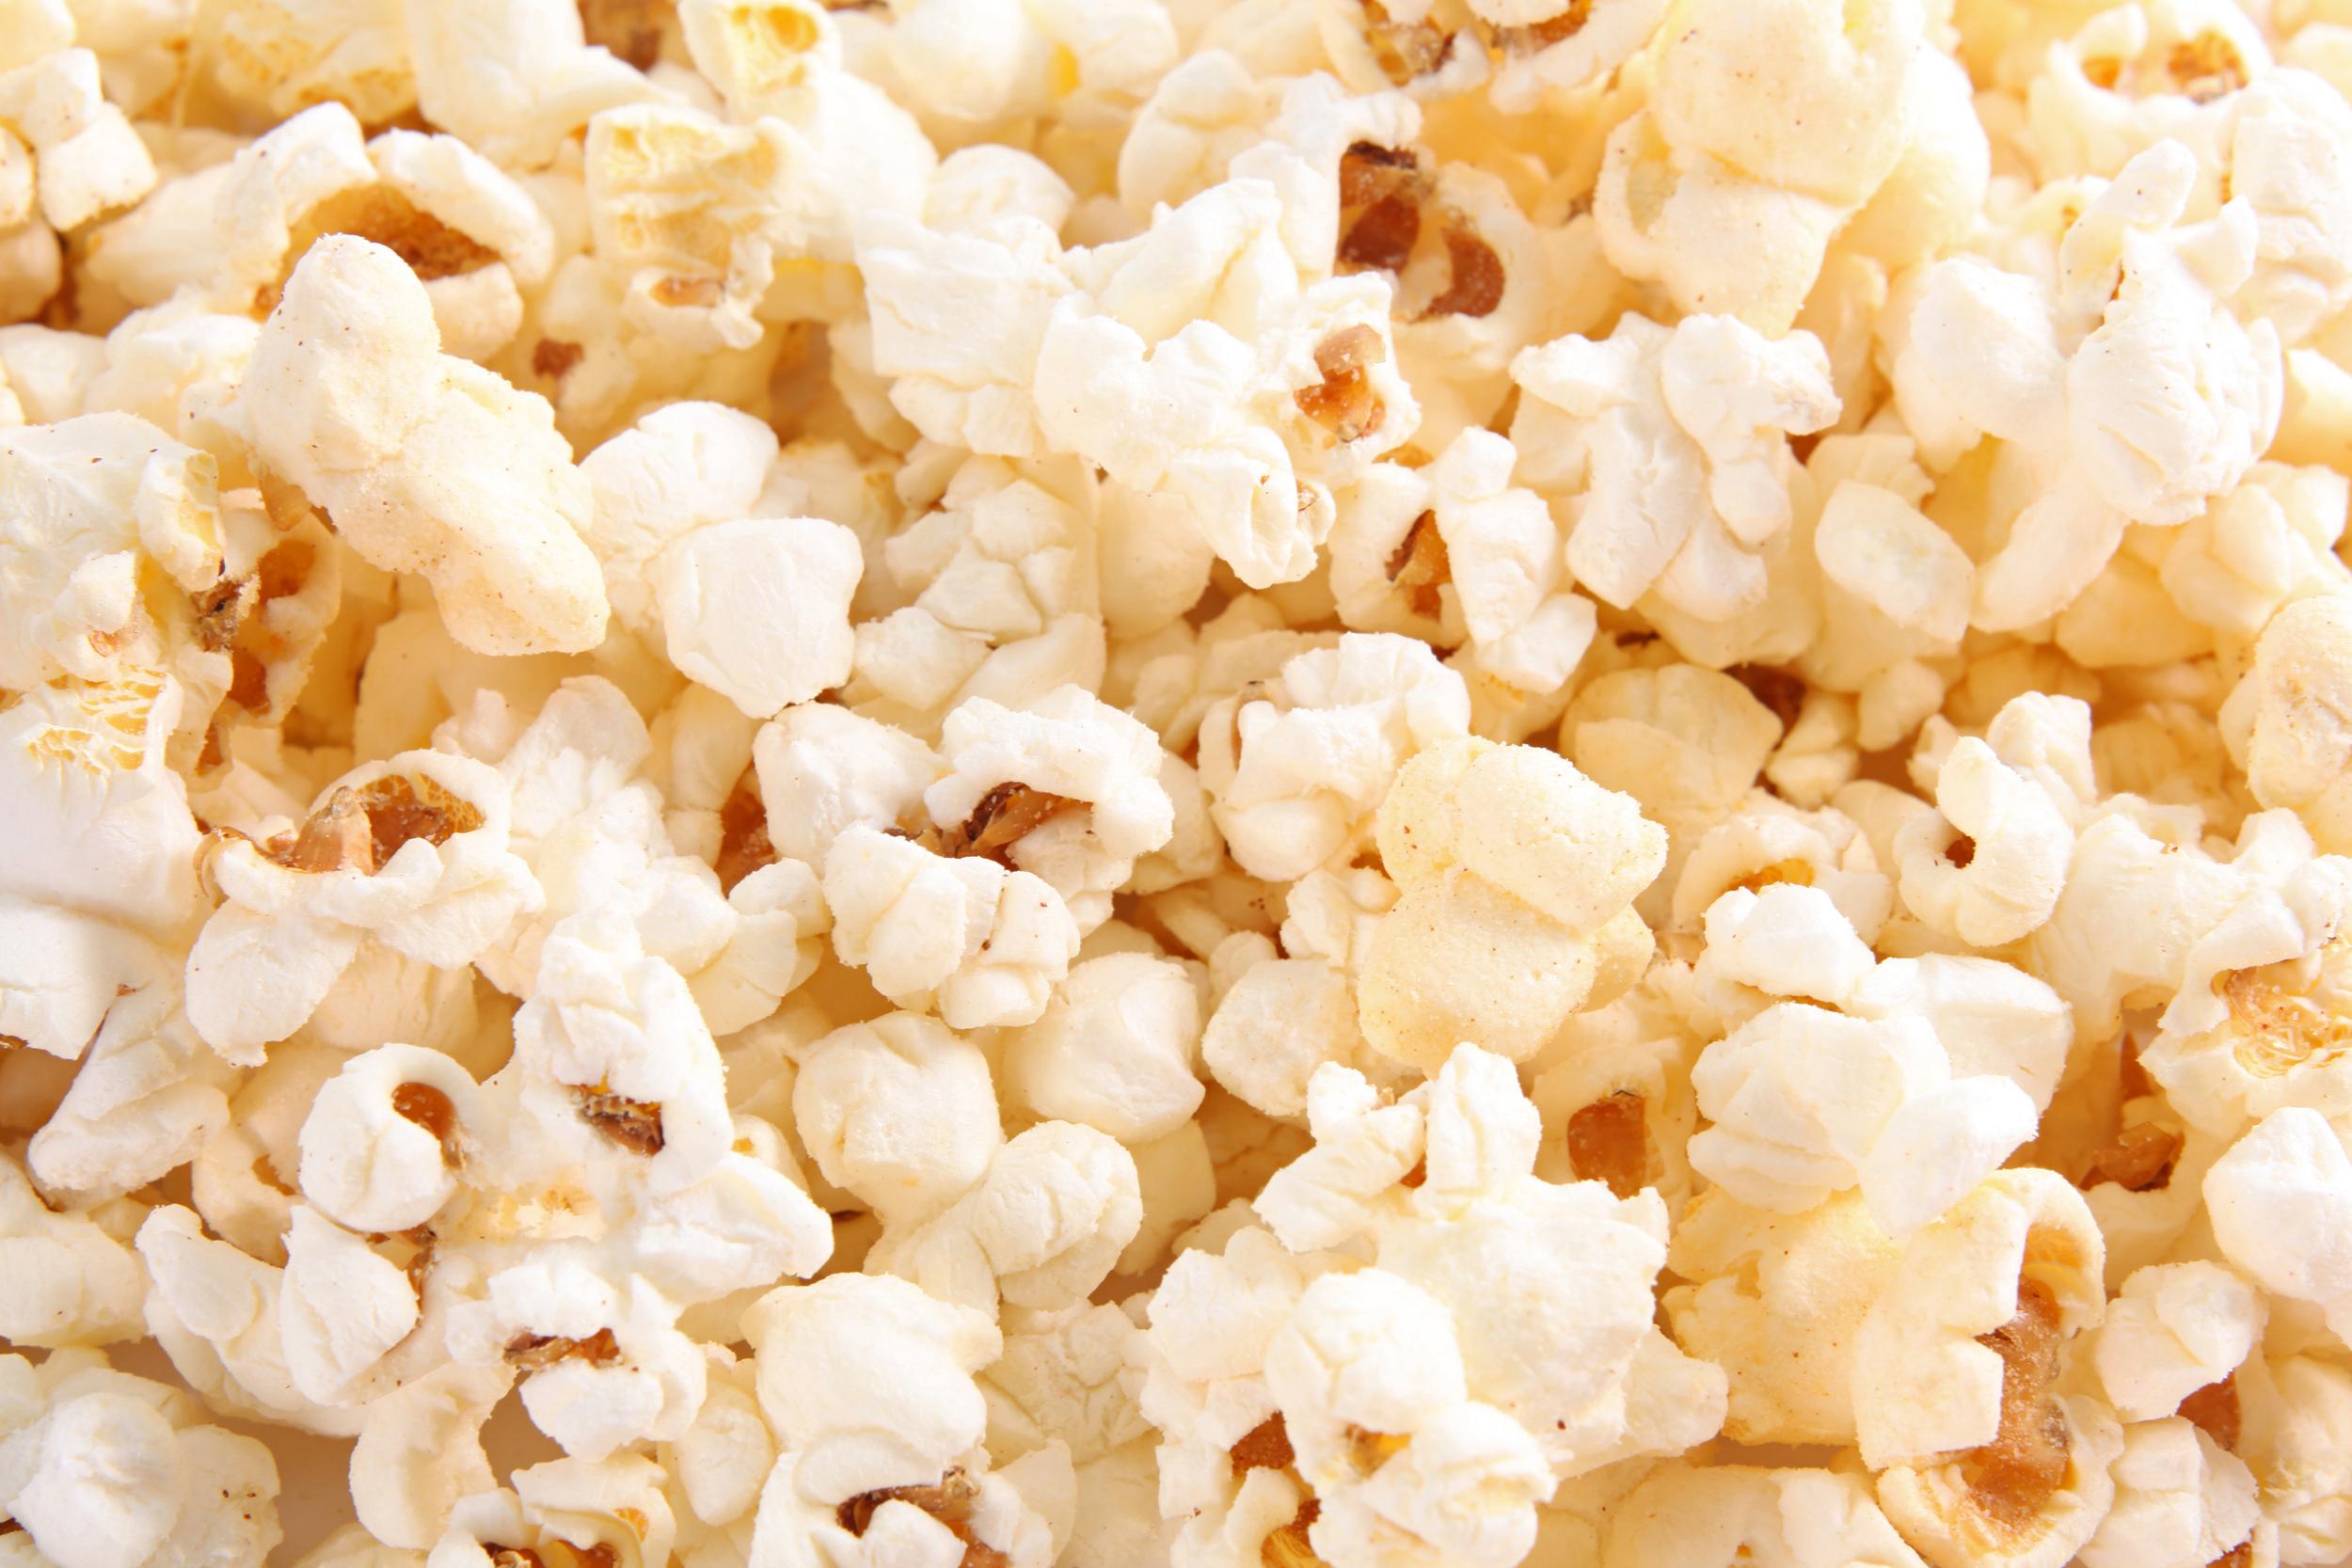 Popcorn Hd Wallpaper Background Image 2500x1667 Id